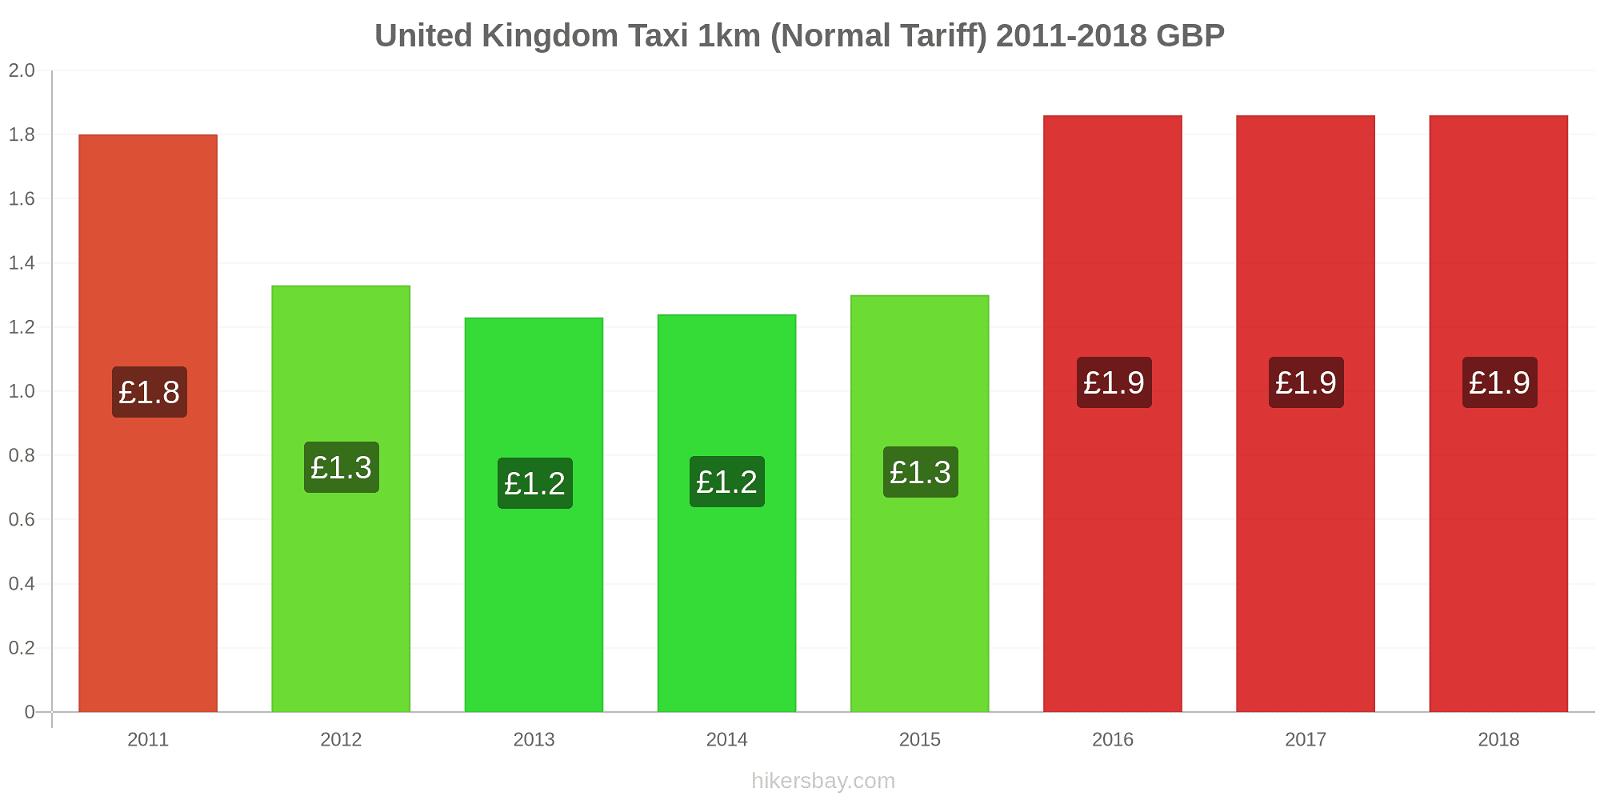 United Kingdom price changes Taxi 1km (Normal Tariff) hikersbay.com